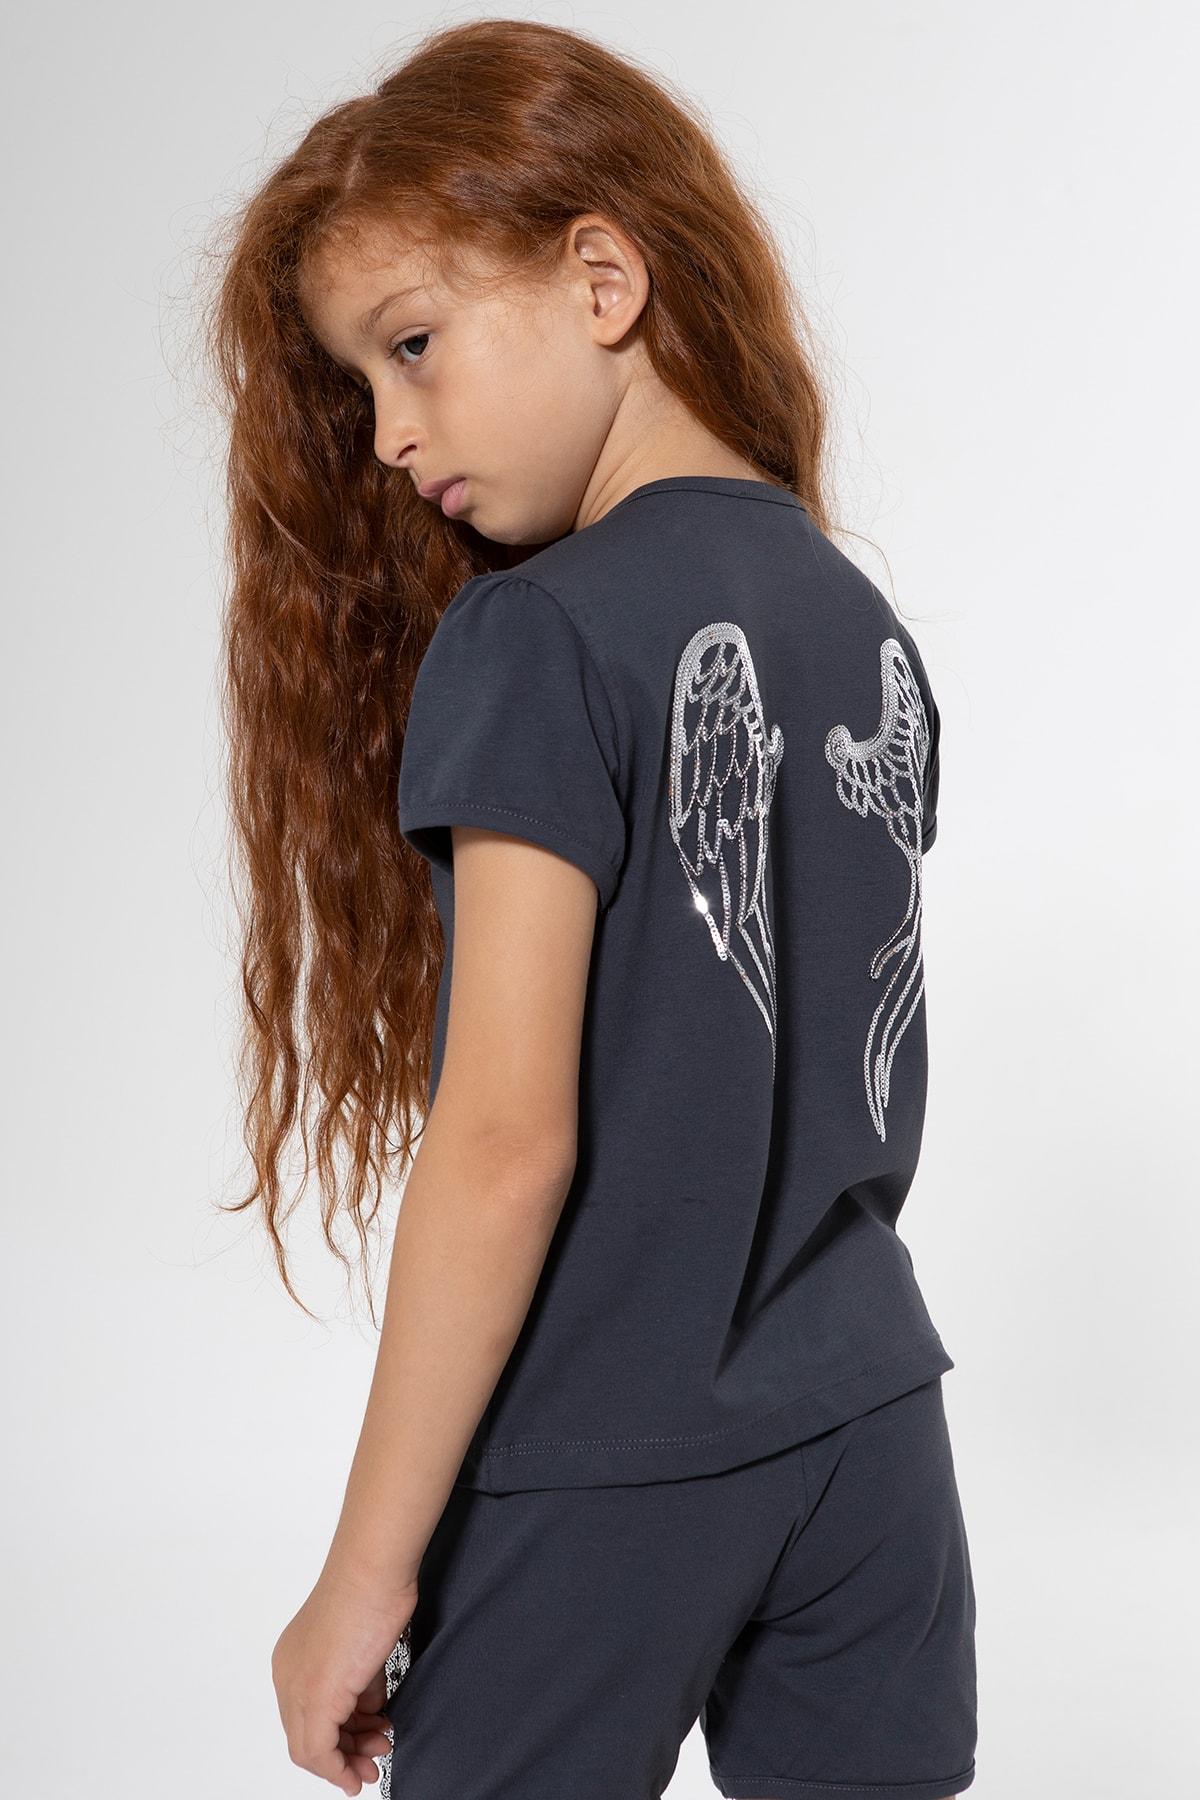 Colorinas Kız Çocuk Antrasit Melek Kanatlı T-Shirt 1